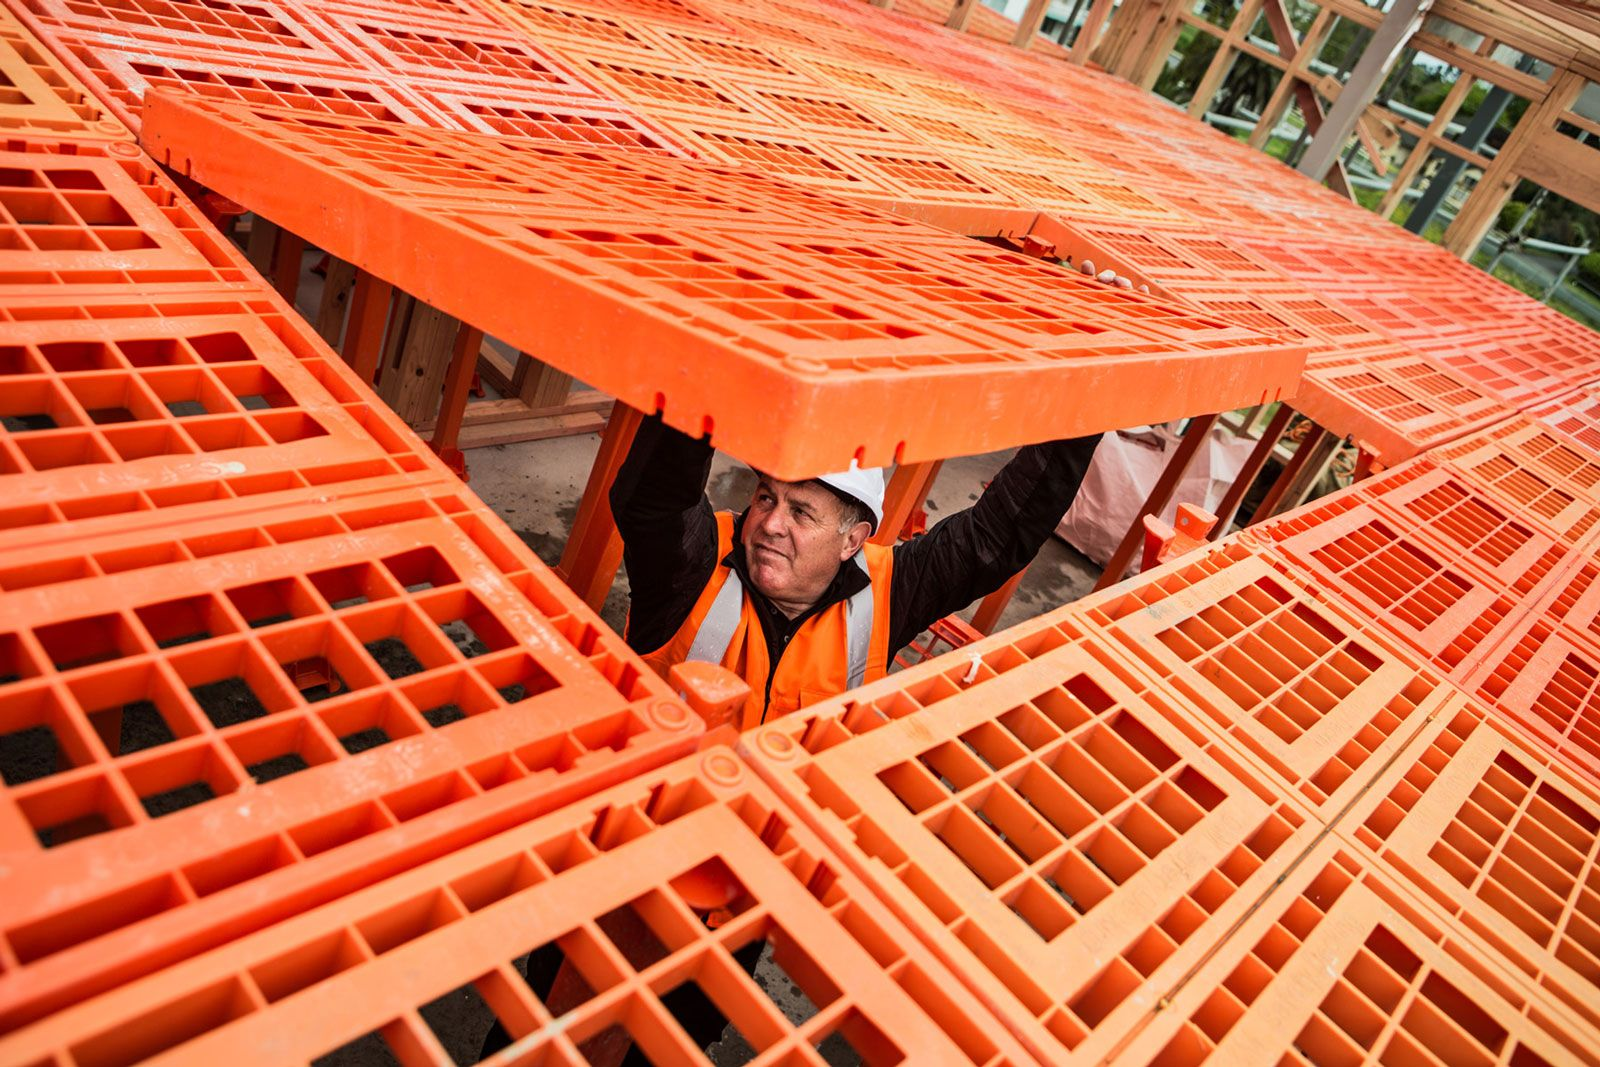 Builder installing workdek